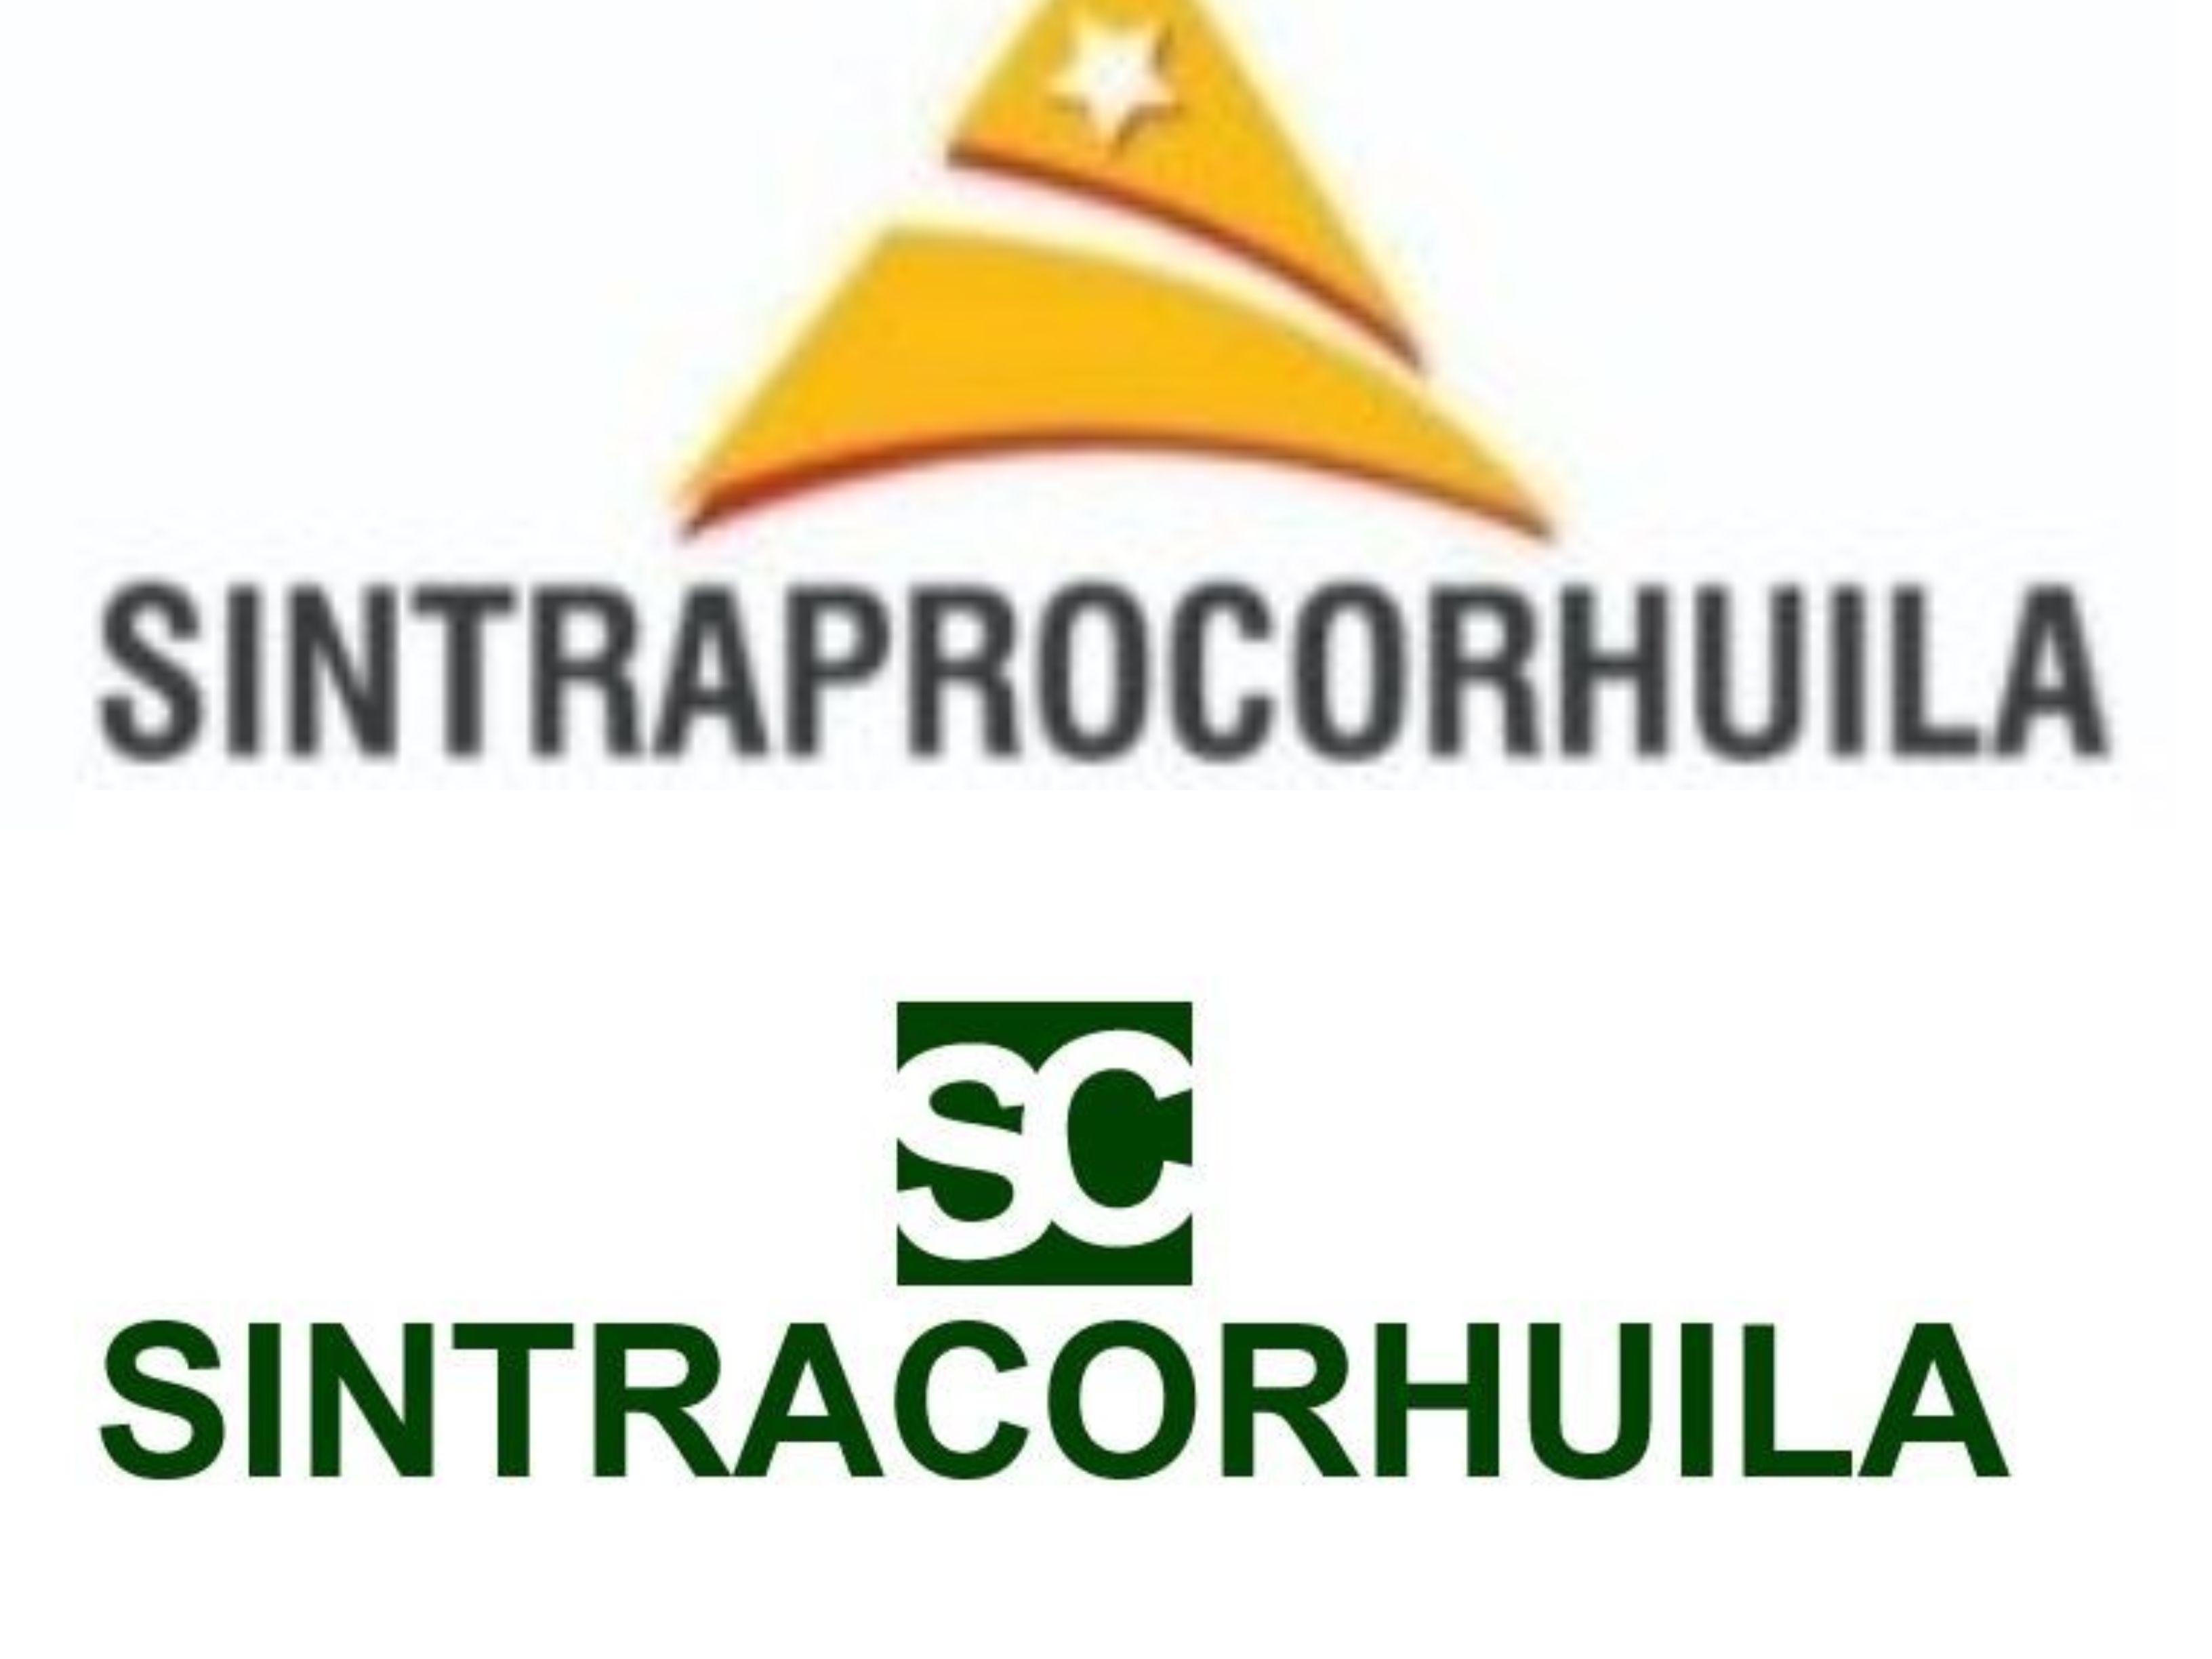 Carta al Consejo Superior de la Corhuila